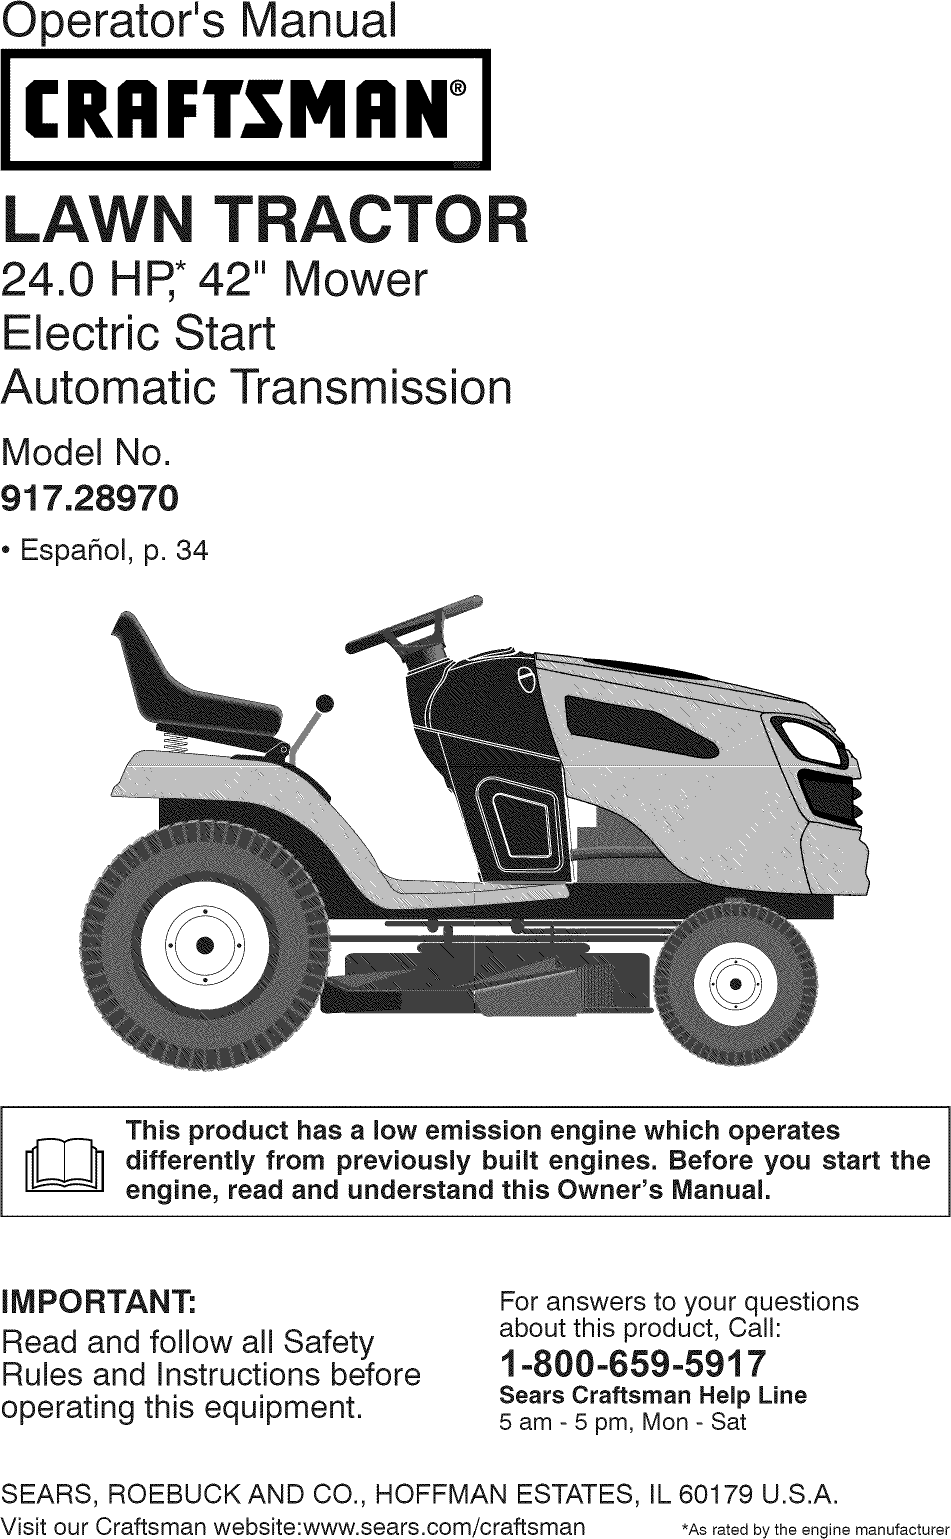 craftsman 917289700 user manual tractor manuals and guides l0901665 rh usermanual wiki owners manual craftsman dys 4500 lawn tractor Craftsman Tractor Manual PDF